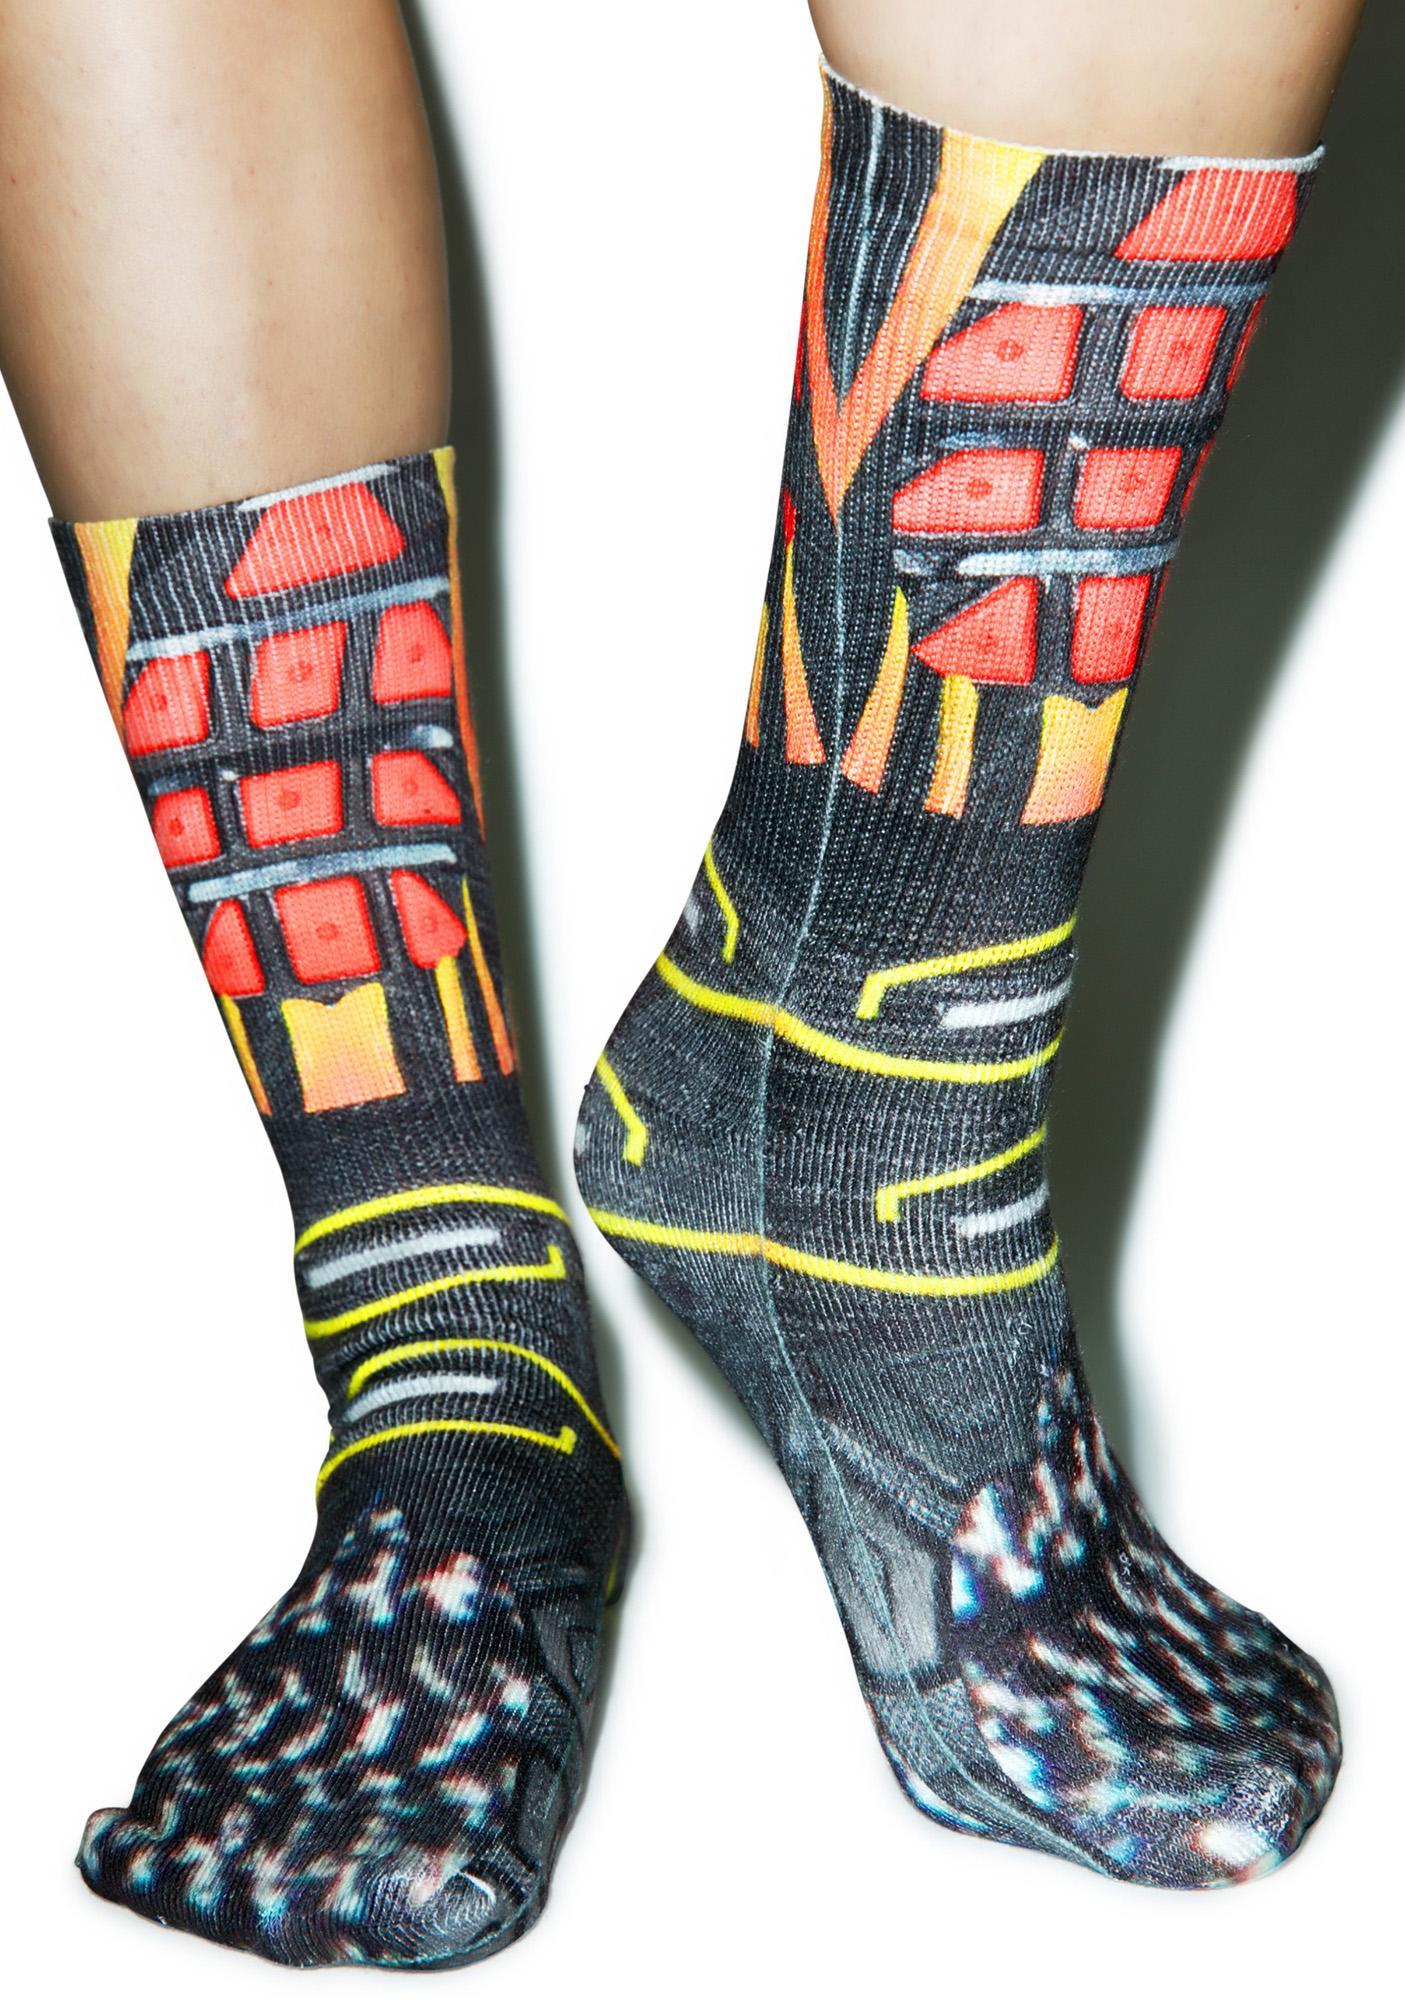 SOWET Tuned Red Socks